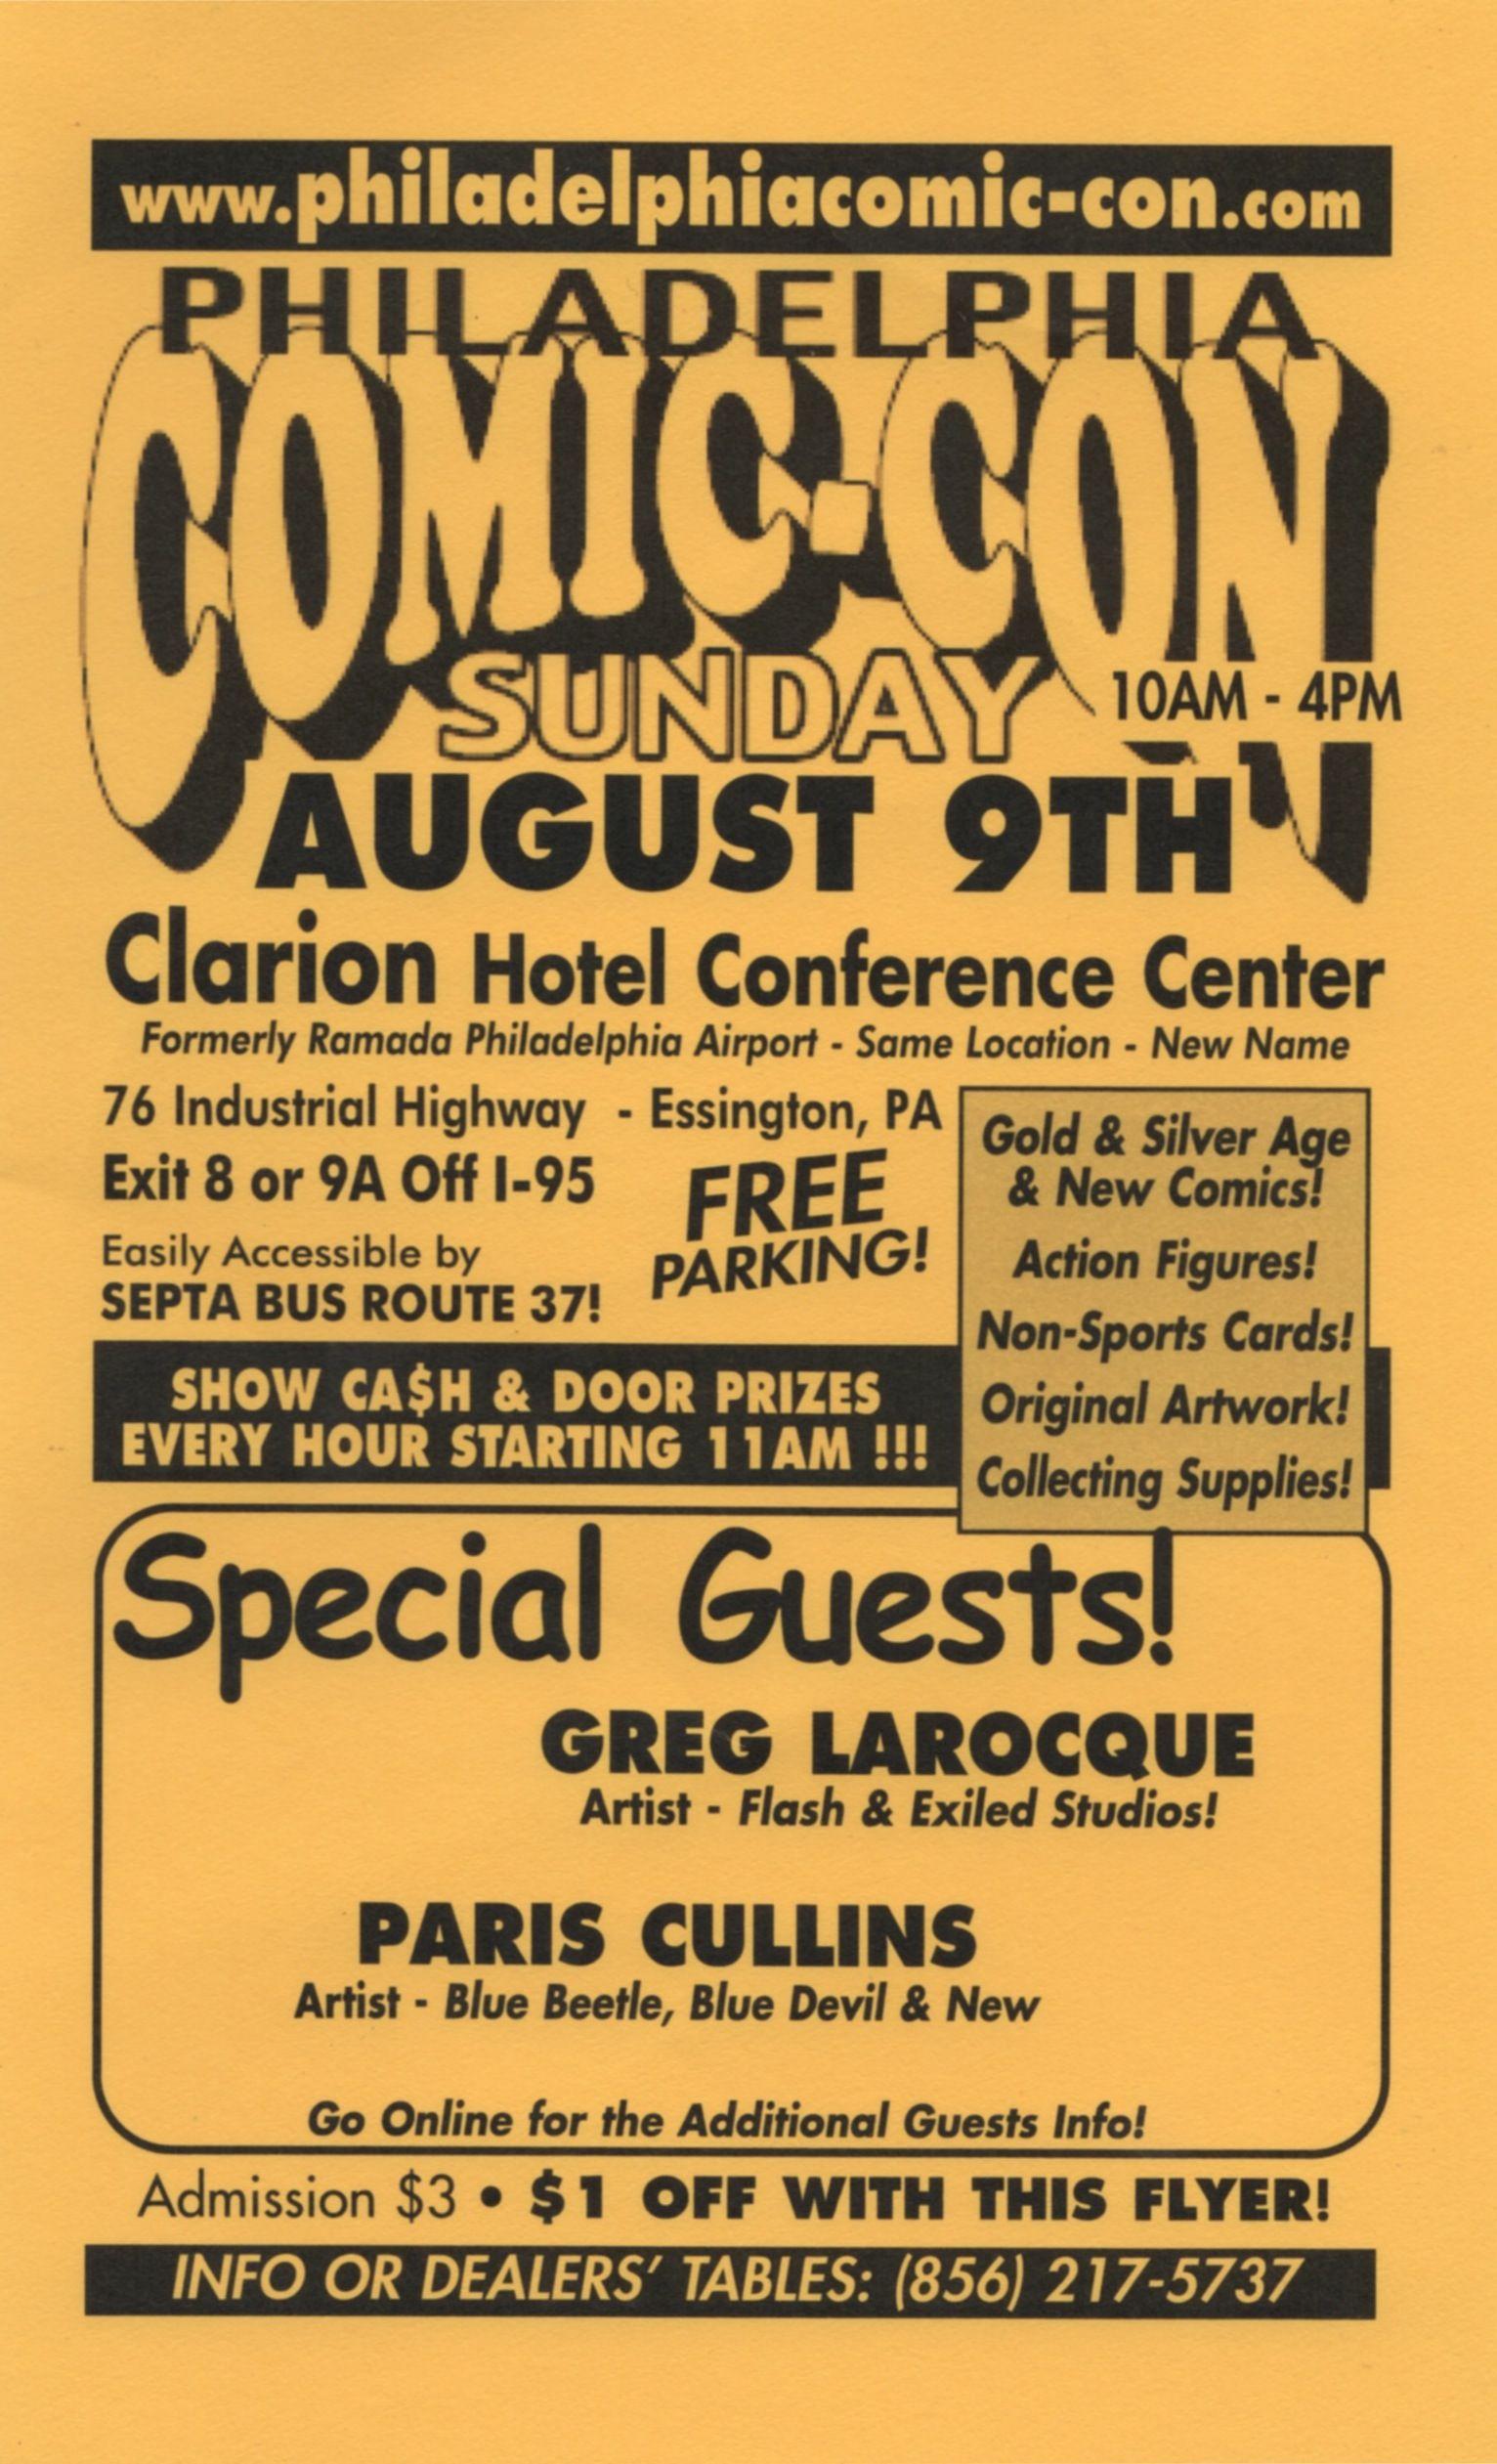 Handbill for Philadelphia Comic-con Sunday, August 9, 2015